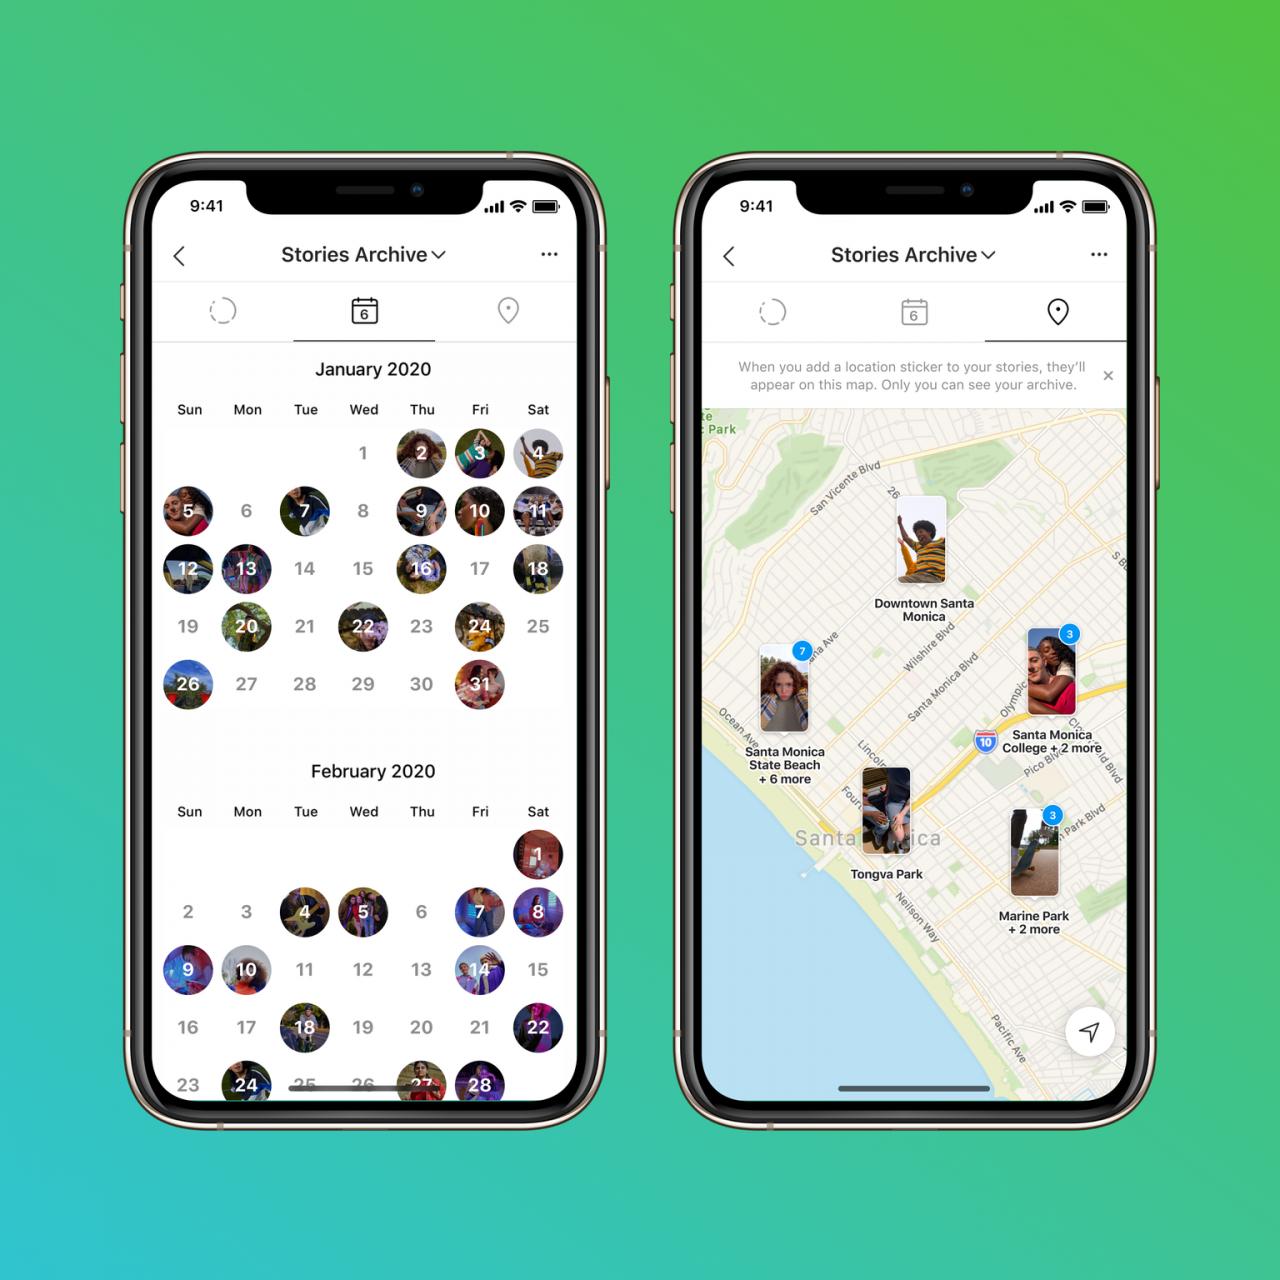 Instagram Stories Map